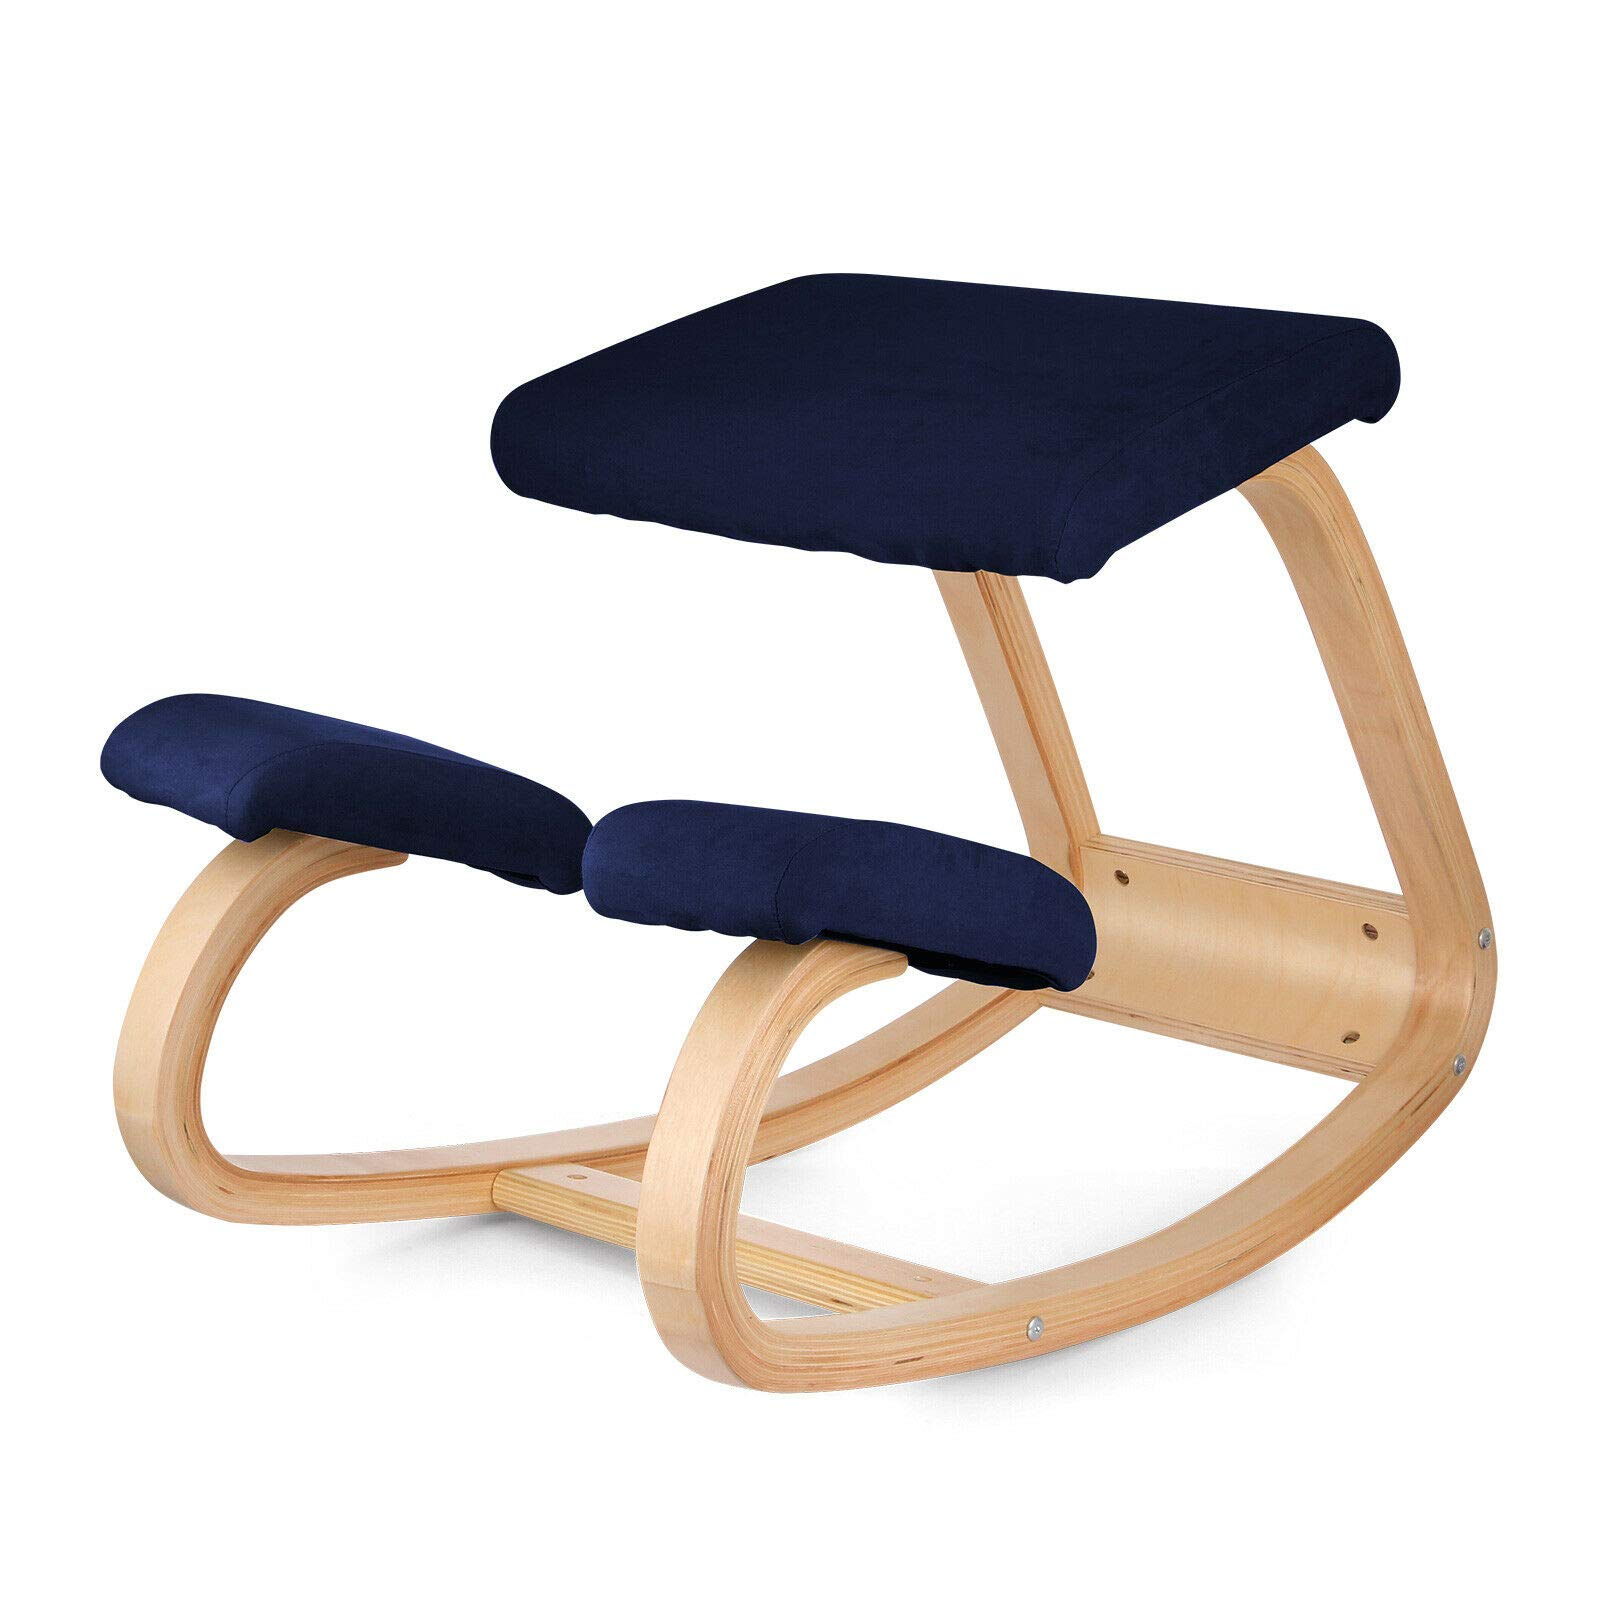 Office Study Kneeling Chair Bentwood Ergonomic Wood Chair Comfortable Relieve Stress Durable Design by Eosphorus BS